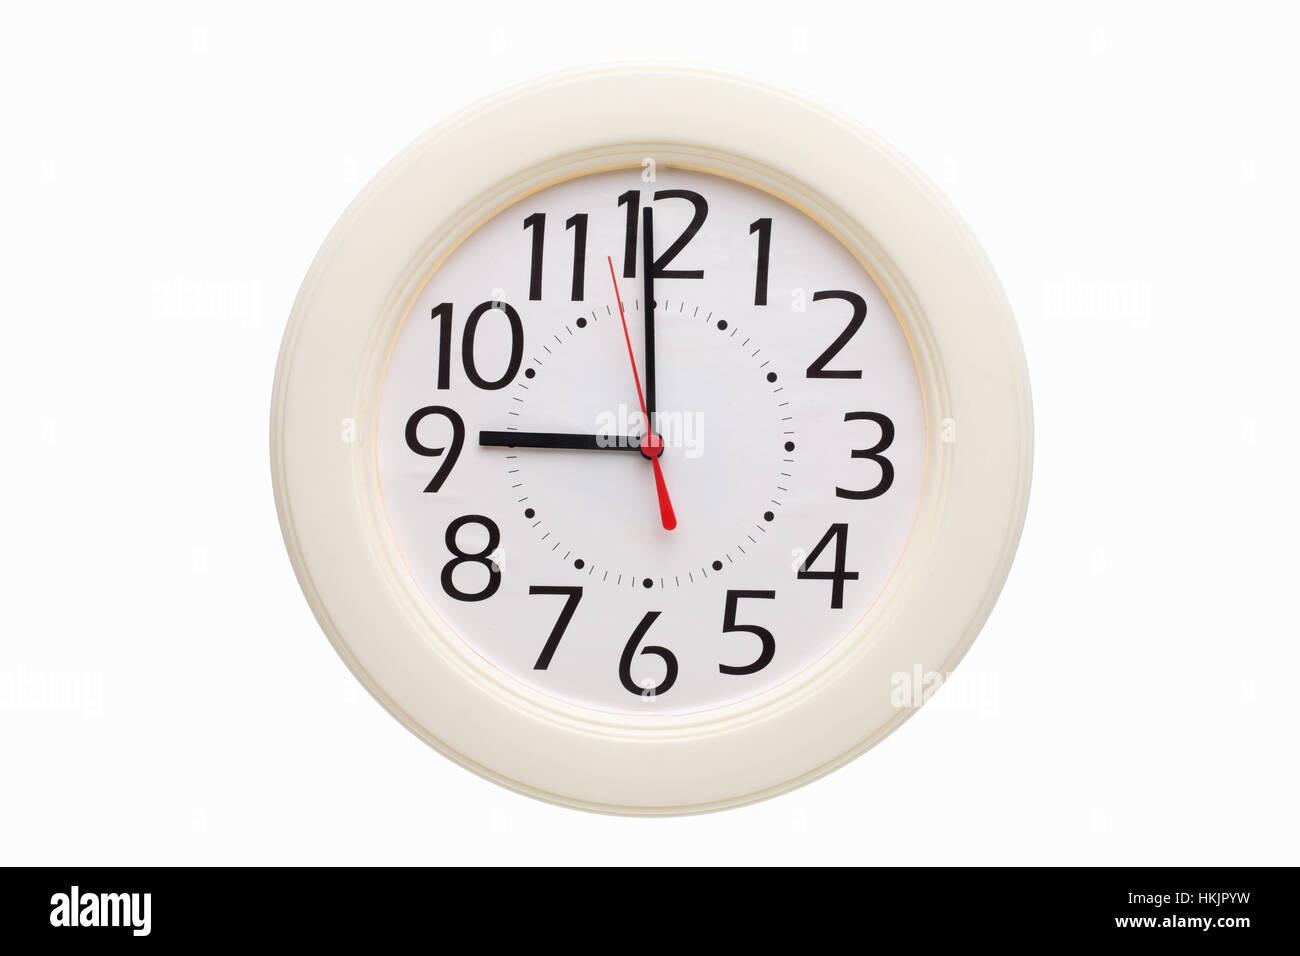 analog wall clock showing nine o'clock - Stock Image